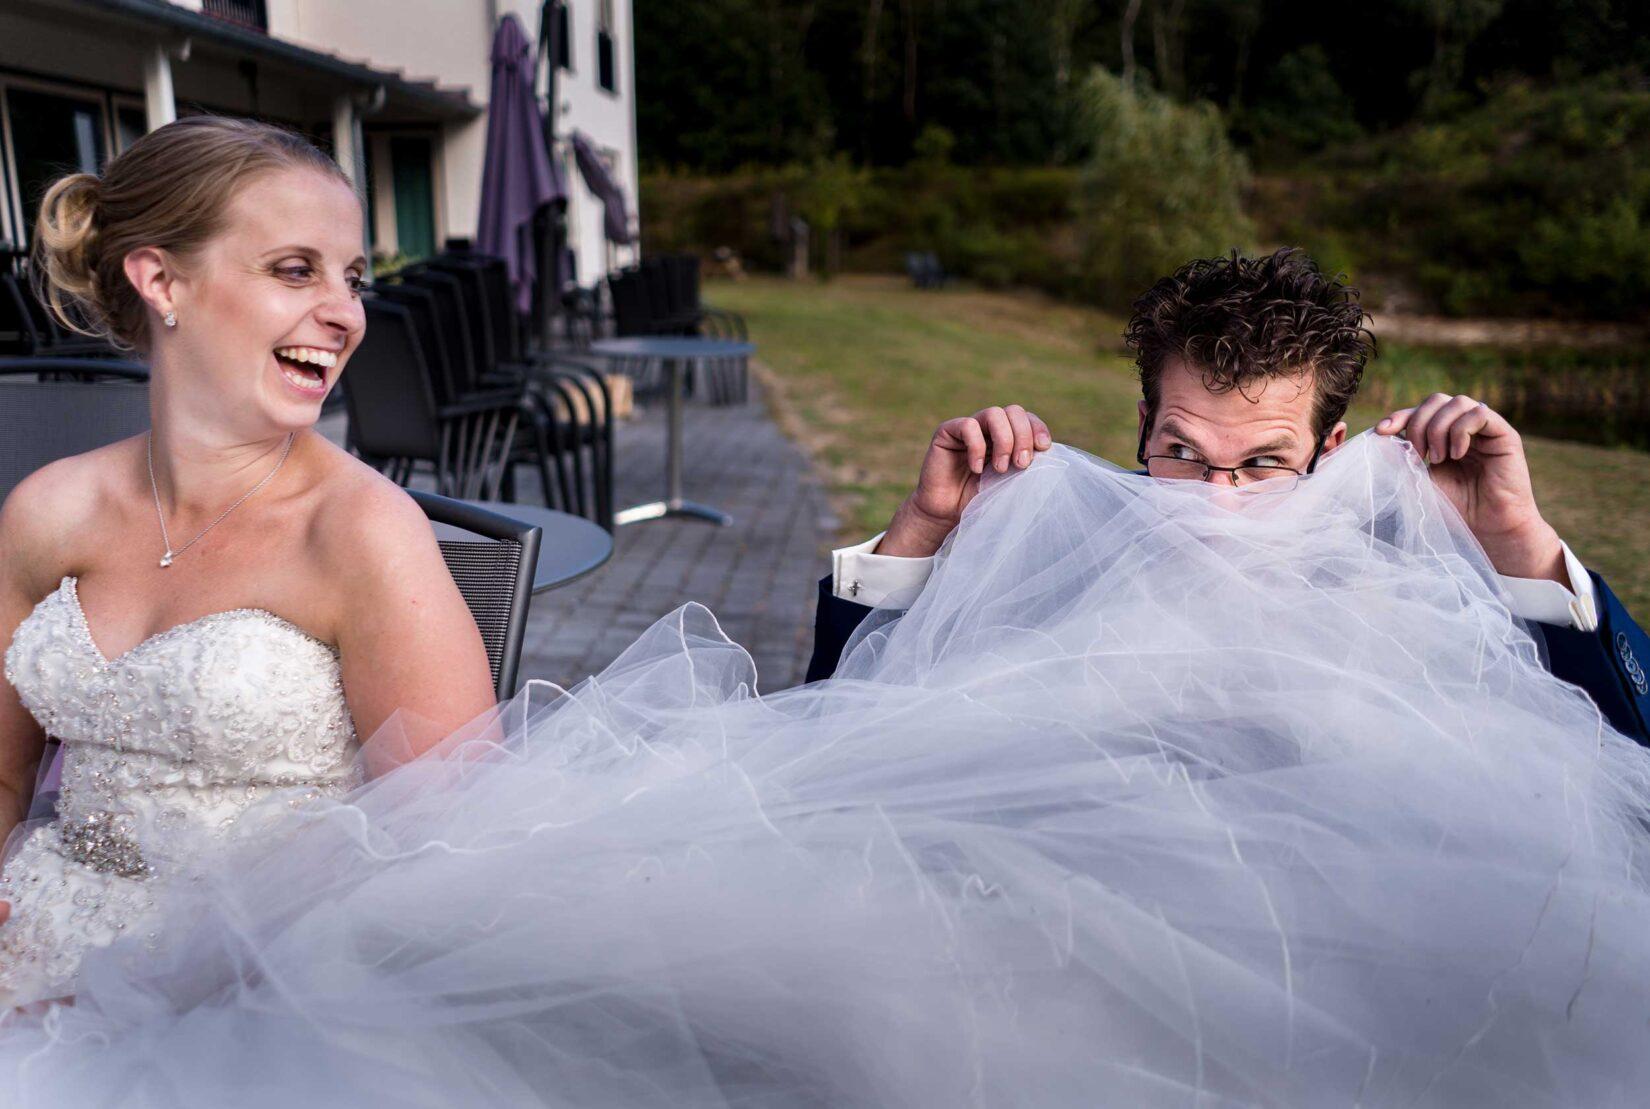 Bruidegom verstopt achter de bruidsjurk